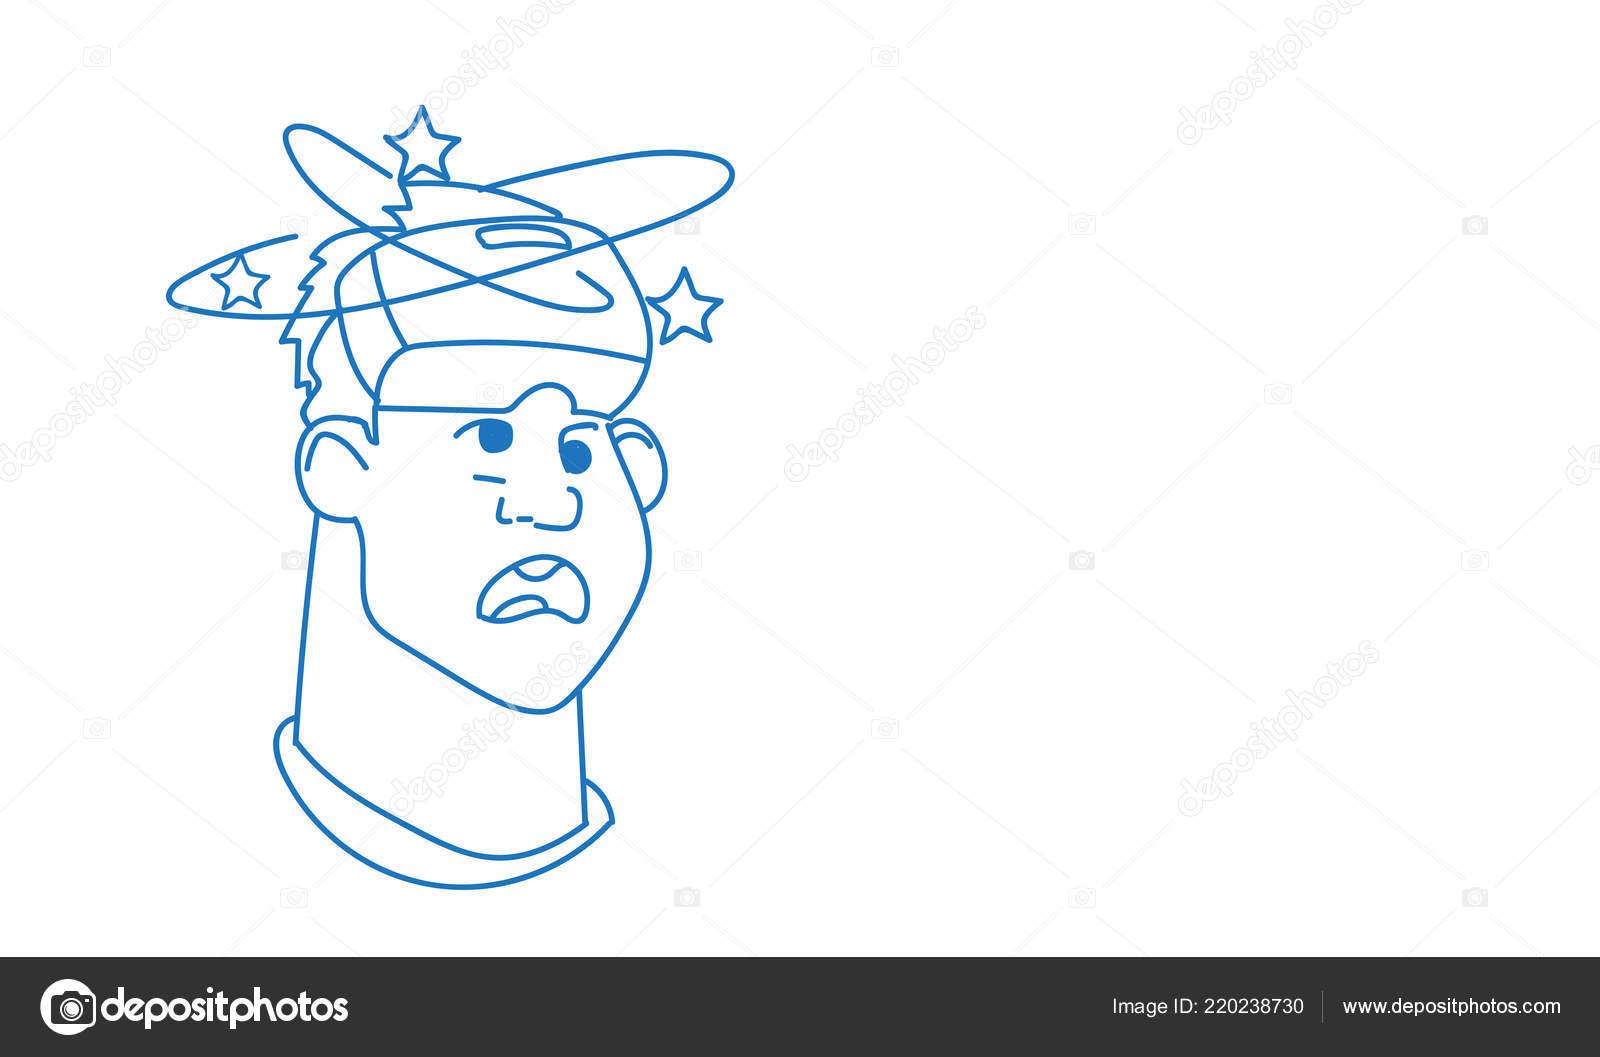 Man dizzy male emoji wearing 3d virtual reality glasses emotion avatar facial expression sketch doodle horizontal